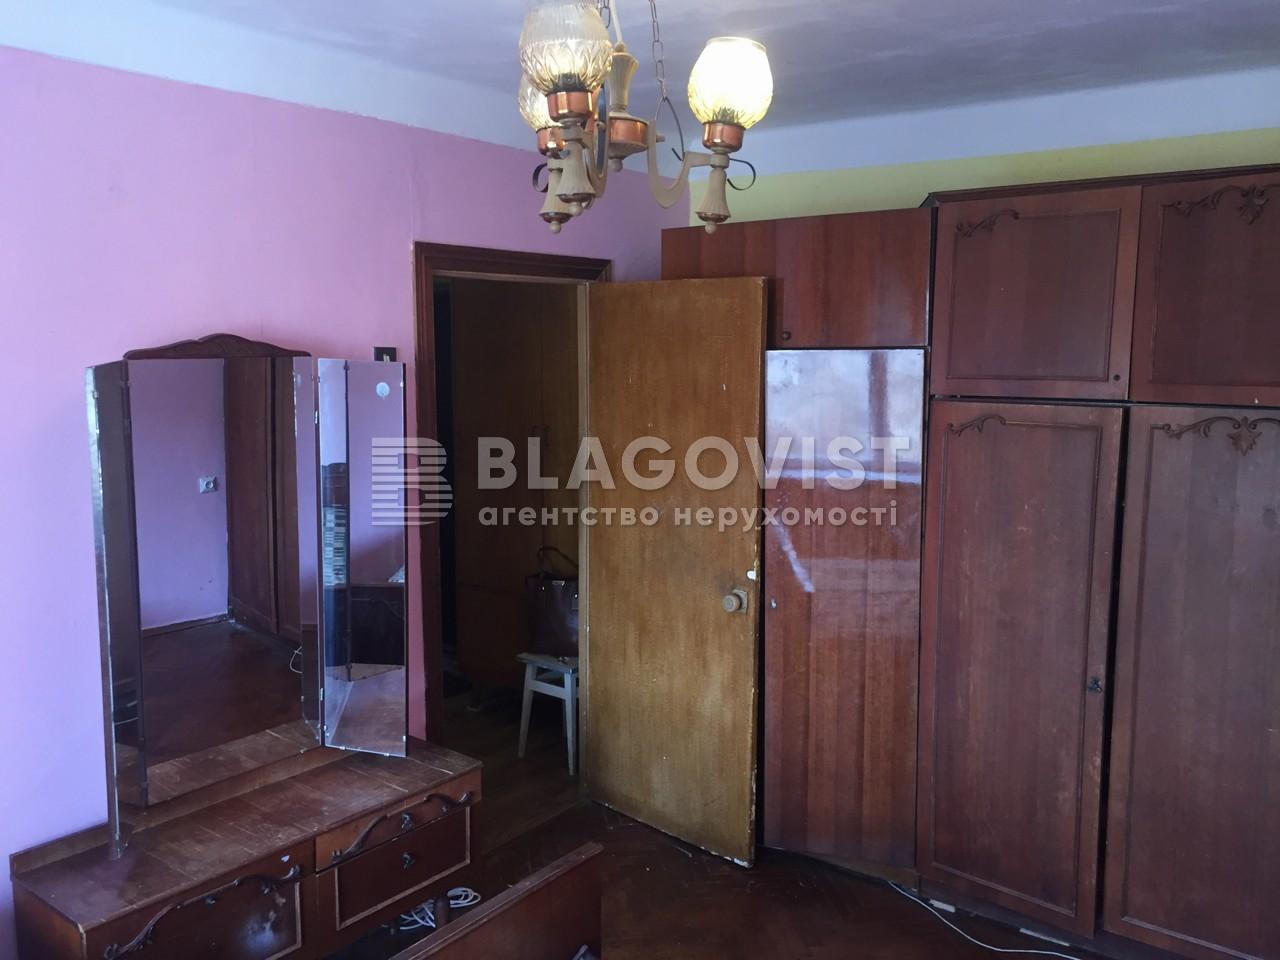 Квартира M-38783, Буслівська, 20, Київ - Фото 12